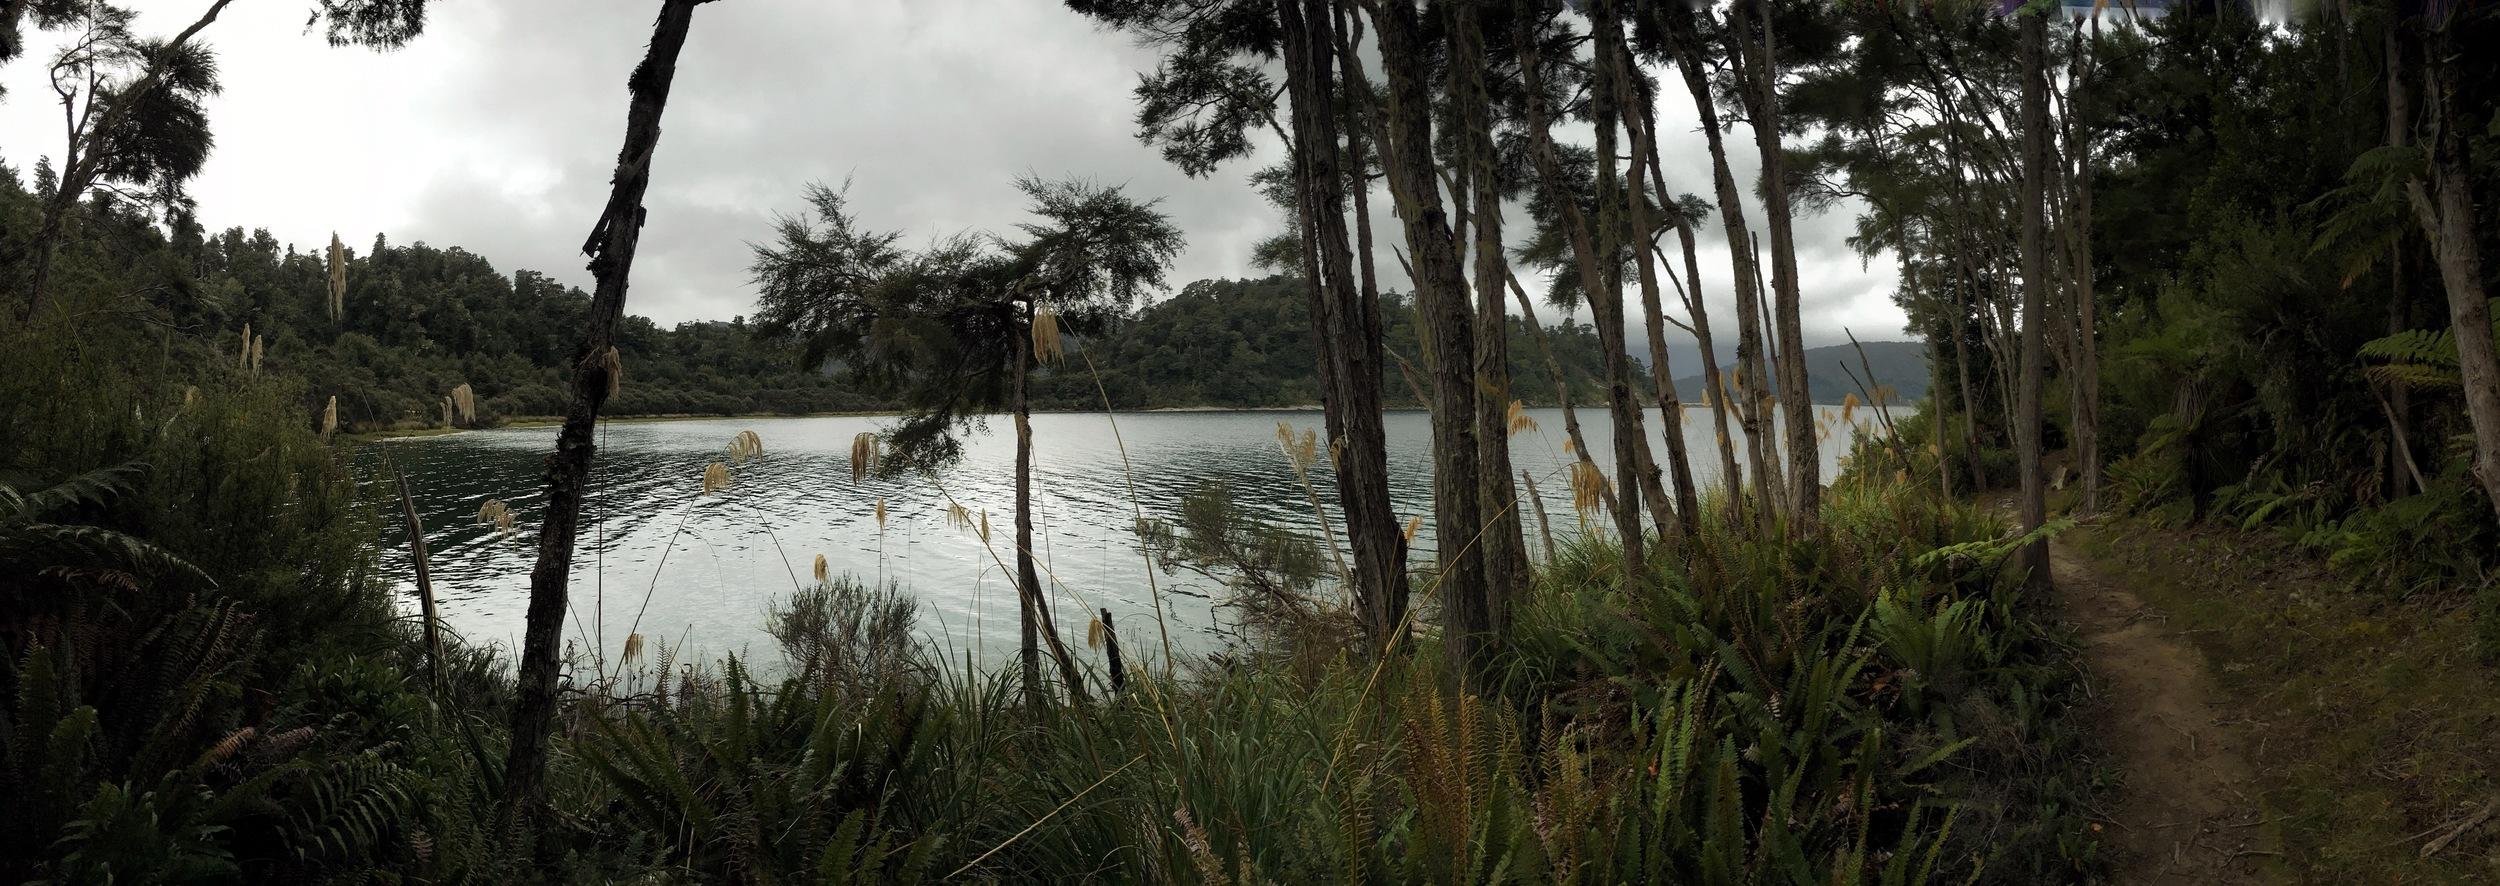 // Panaroma of trail and lake